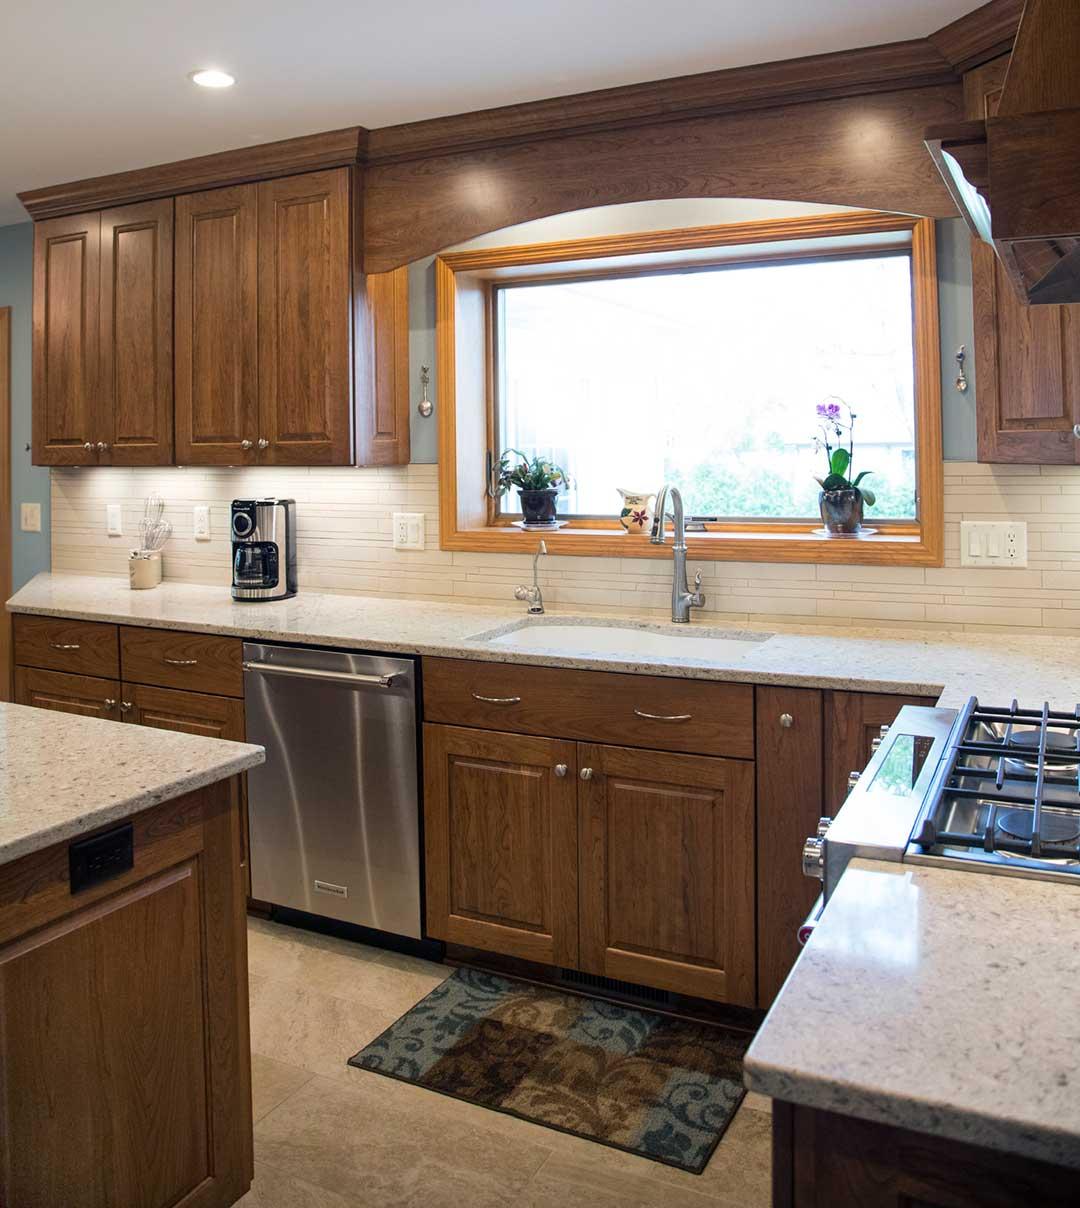 Fitchburg-WI-Transitional-Kitchen-Remodel-Sink